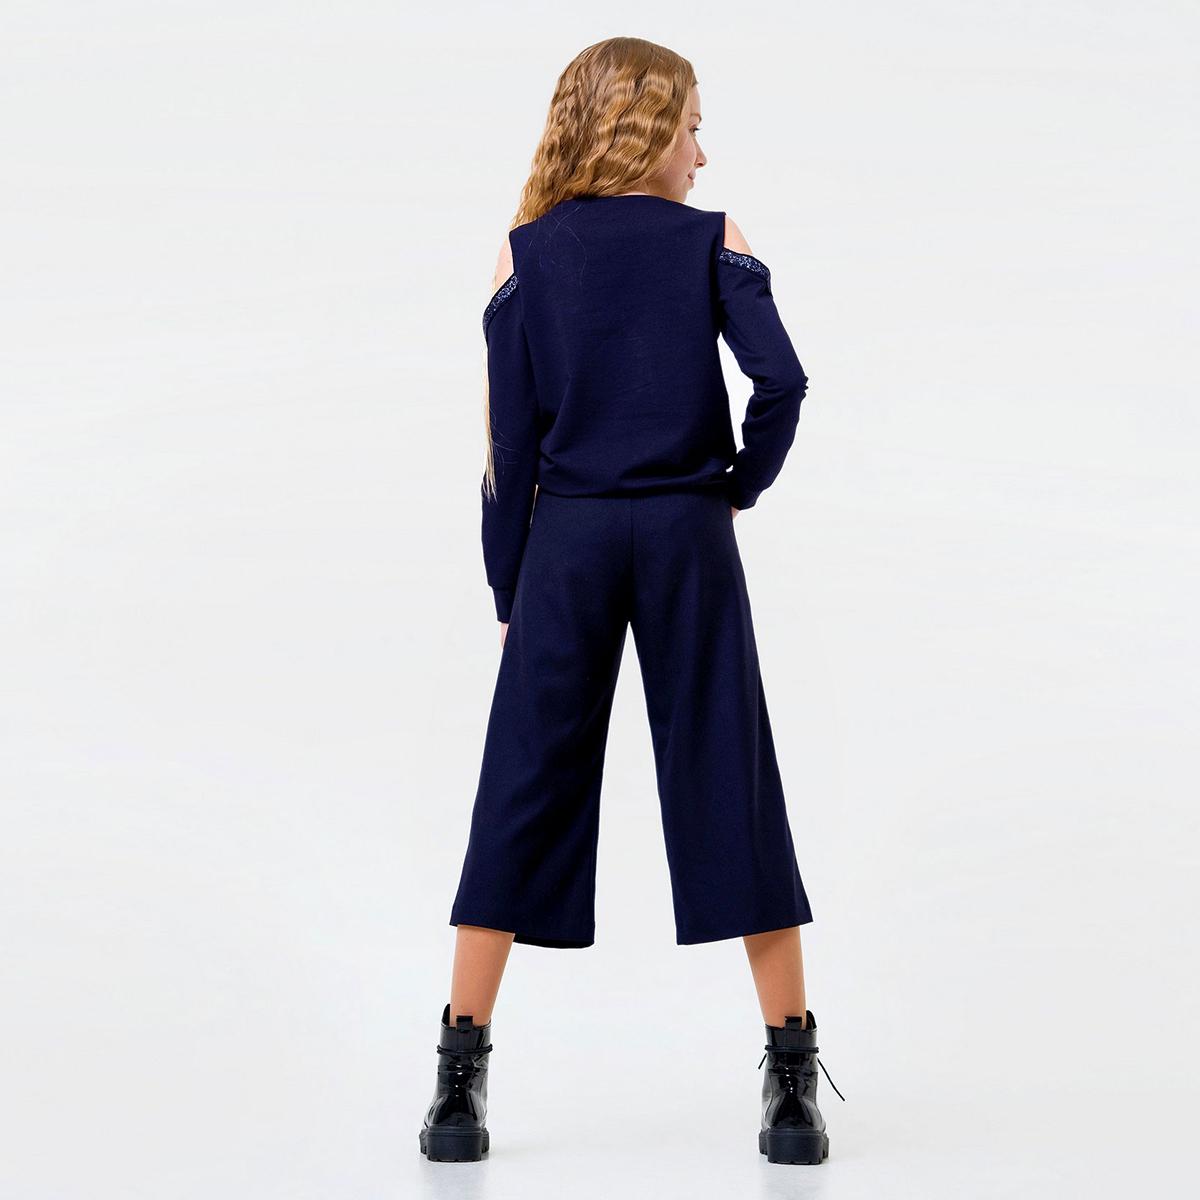 Купить Брюки, джинсы, шорты, Брюки Smil Short Strict Blue, р. 128 115434 ТМ: SMIL, синий